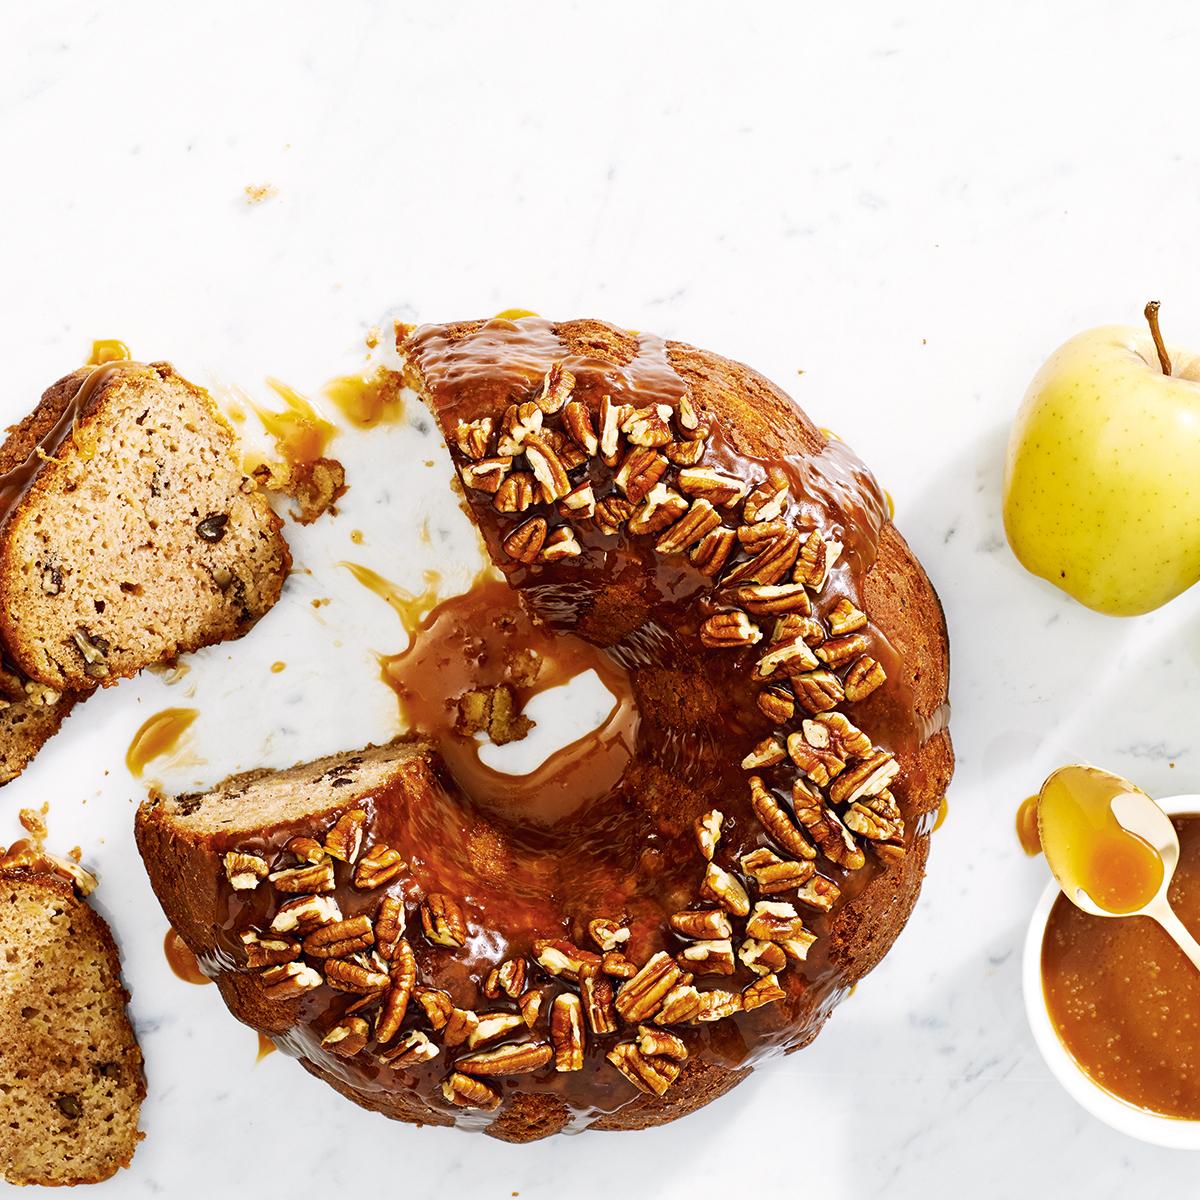 UrbanKitchen: Apple Pecan Bundt Cake With Caramel Sauce